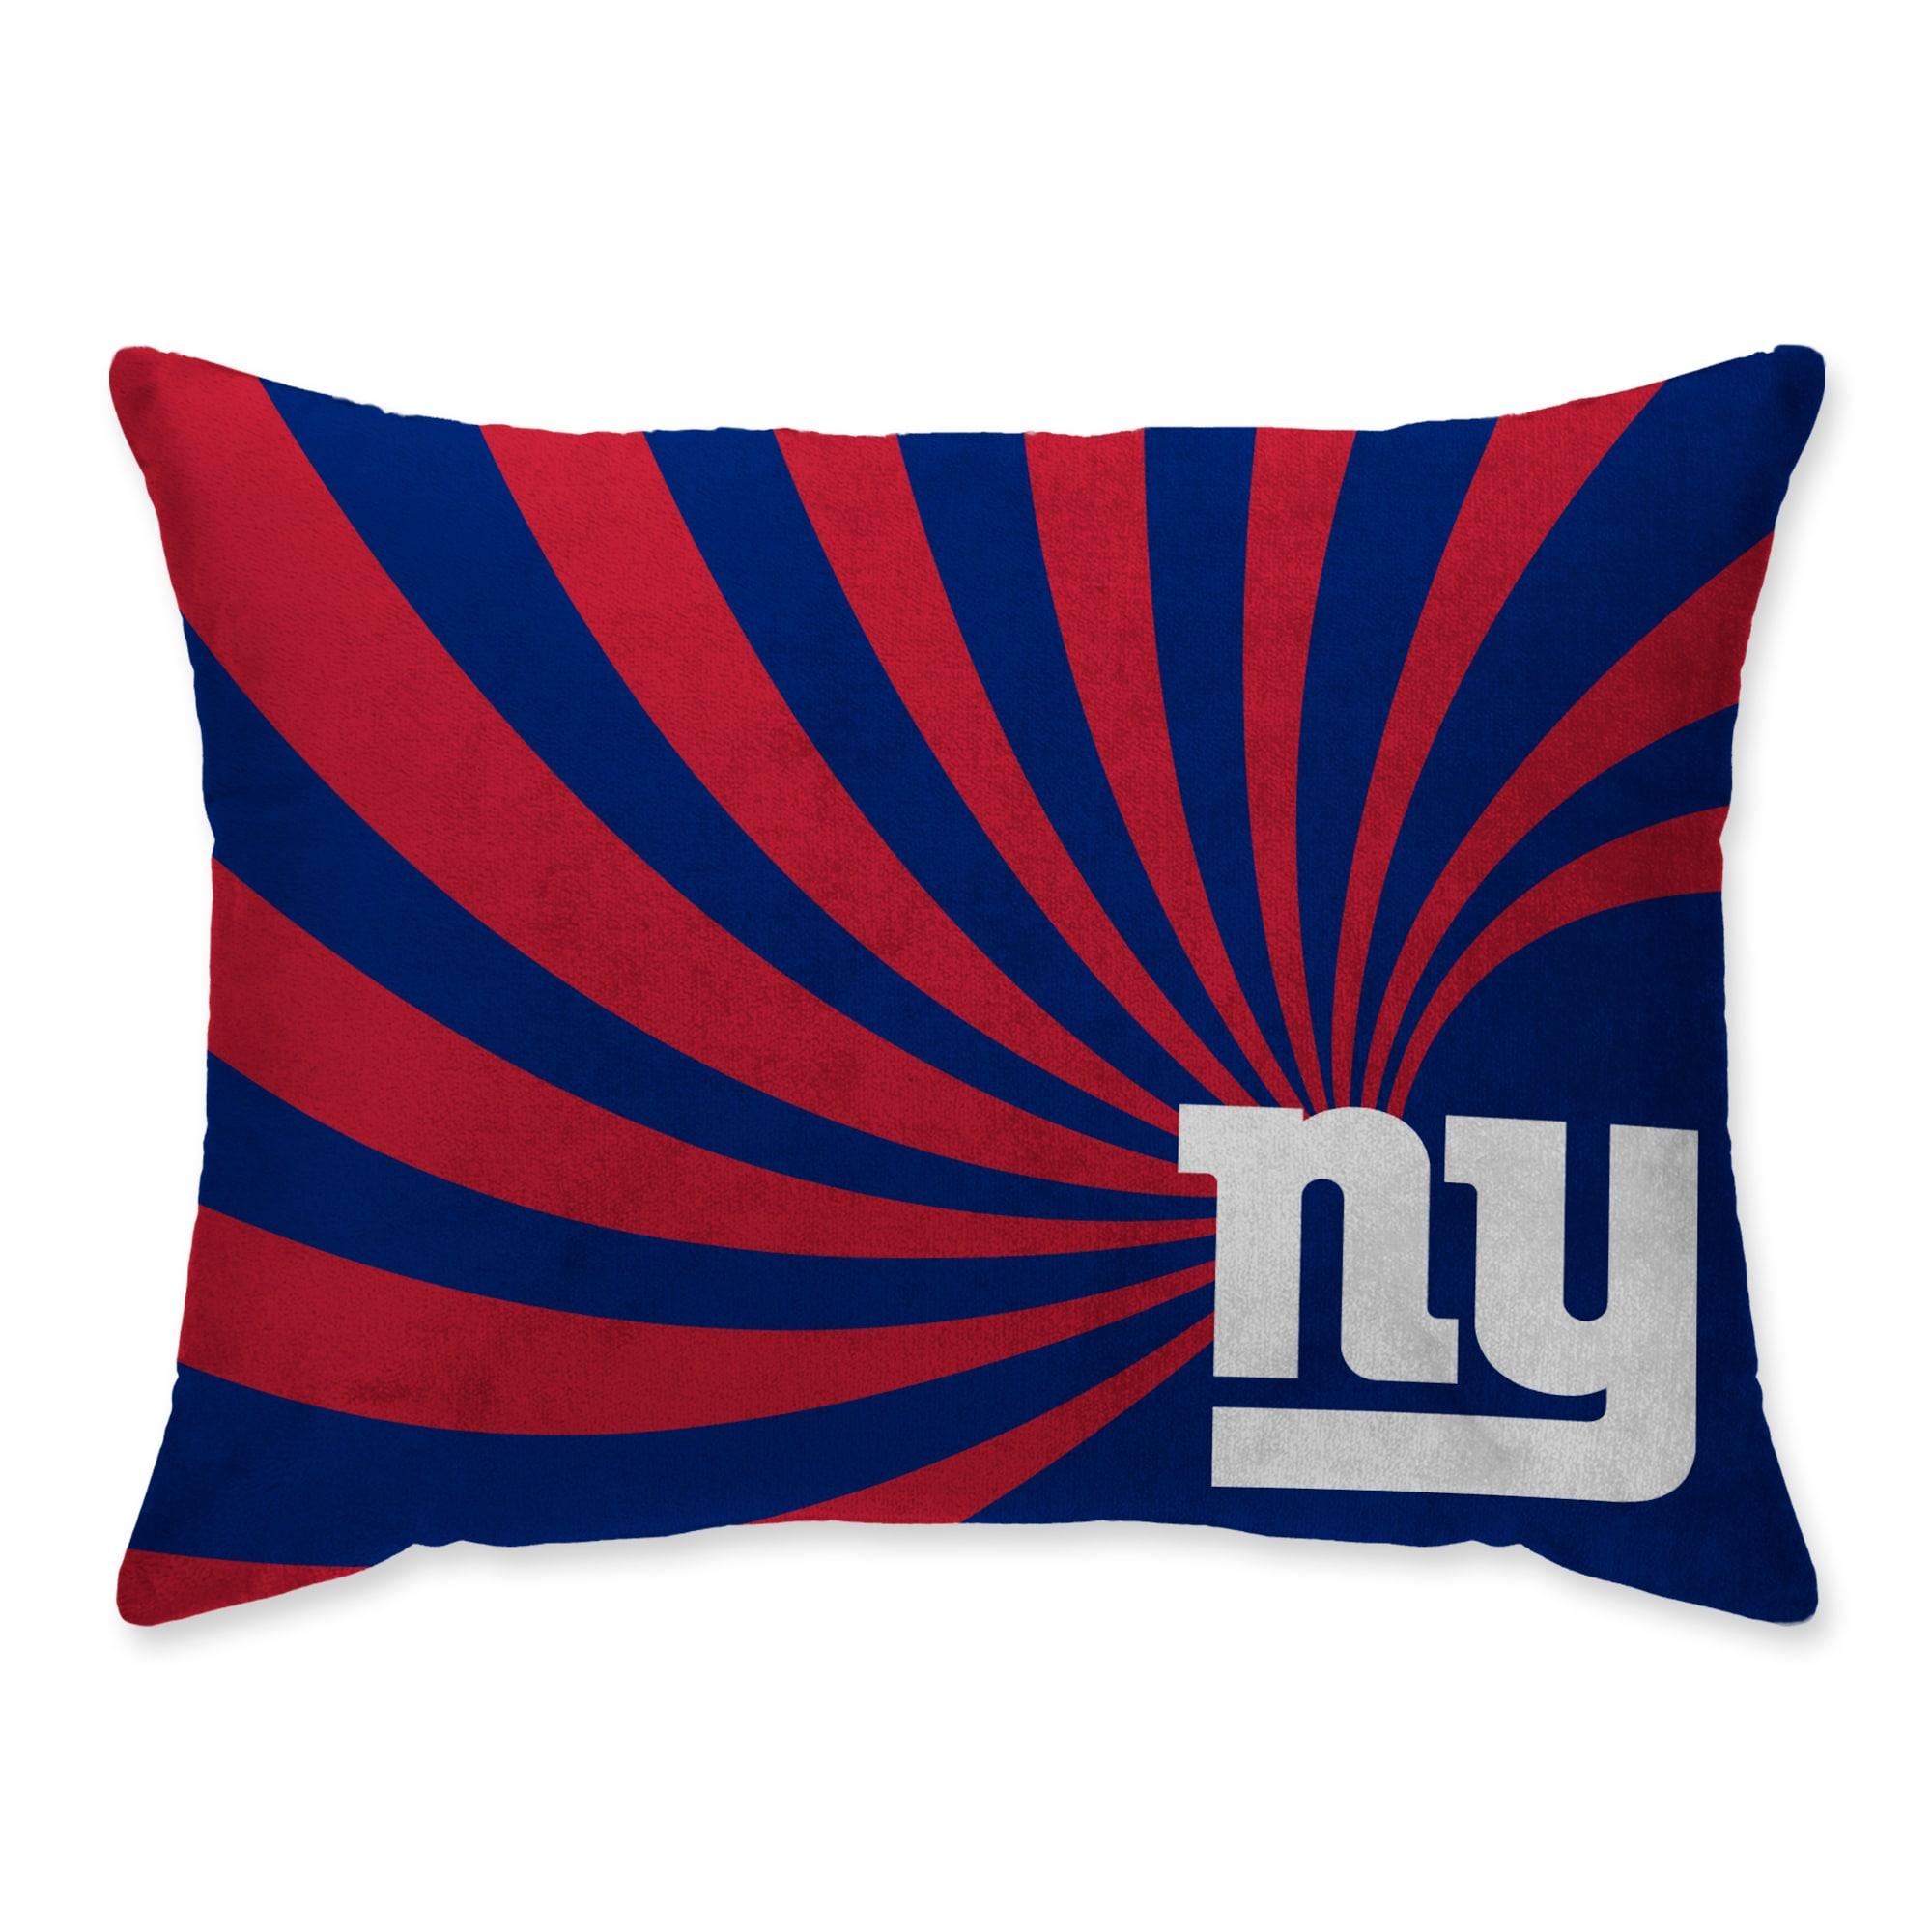 New York Giants Super Plush Mink Wave Bed Pillow - Blue